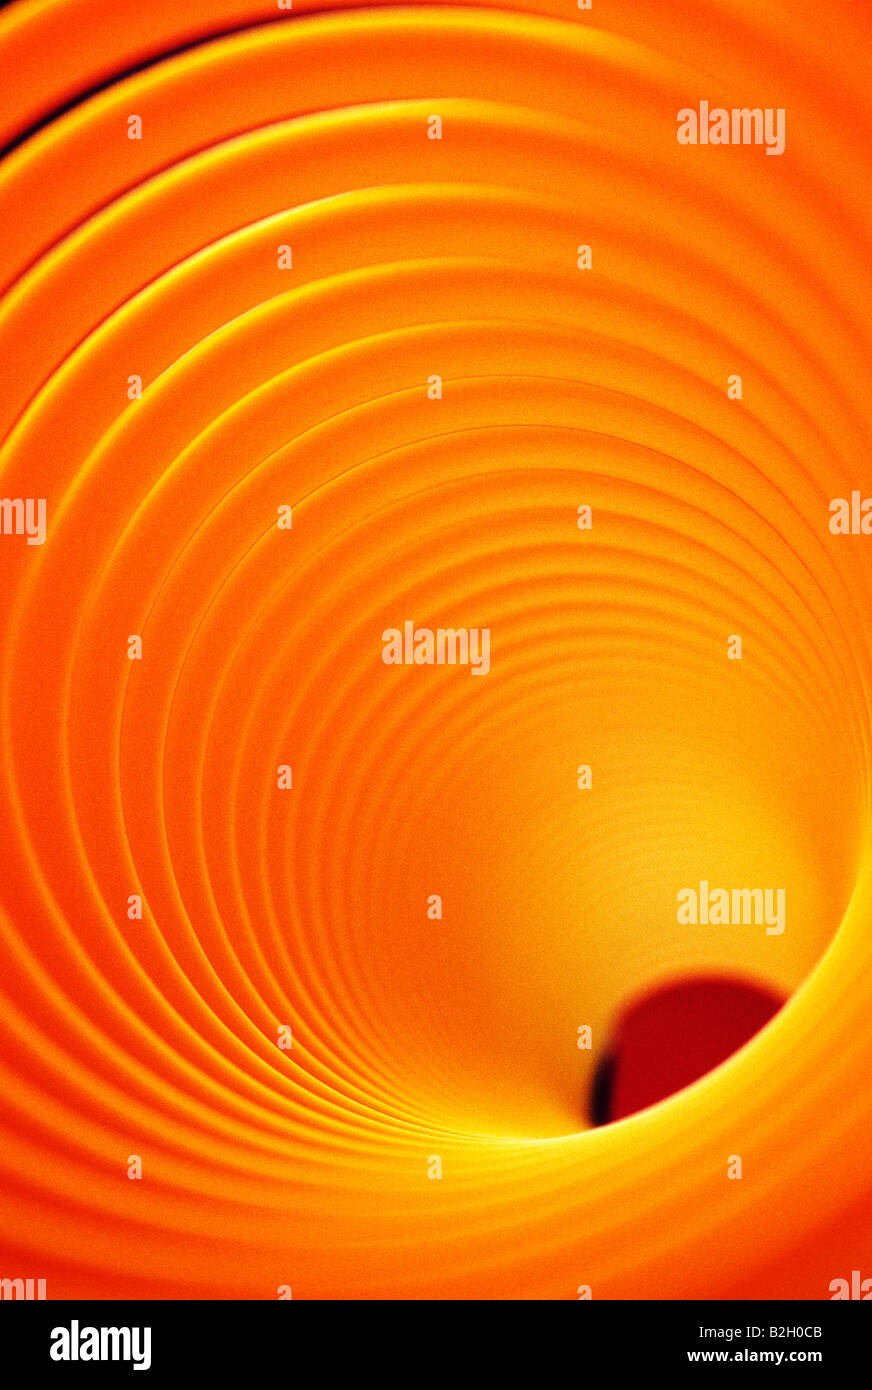 "Abstrakte Nahaufnahme eines Spielzeugs ""Slinky"" Stockbild"